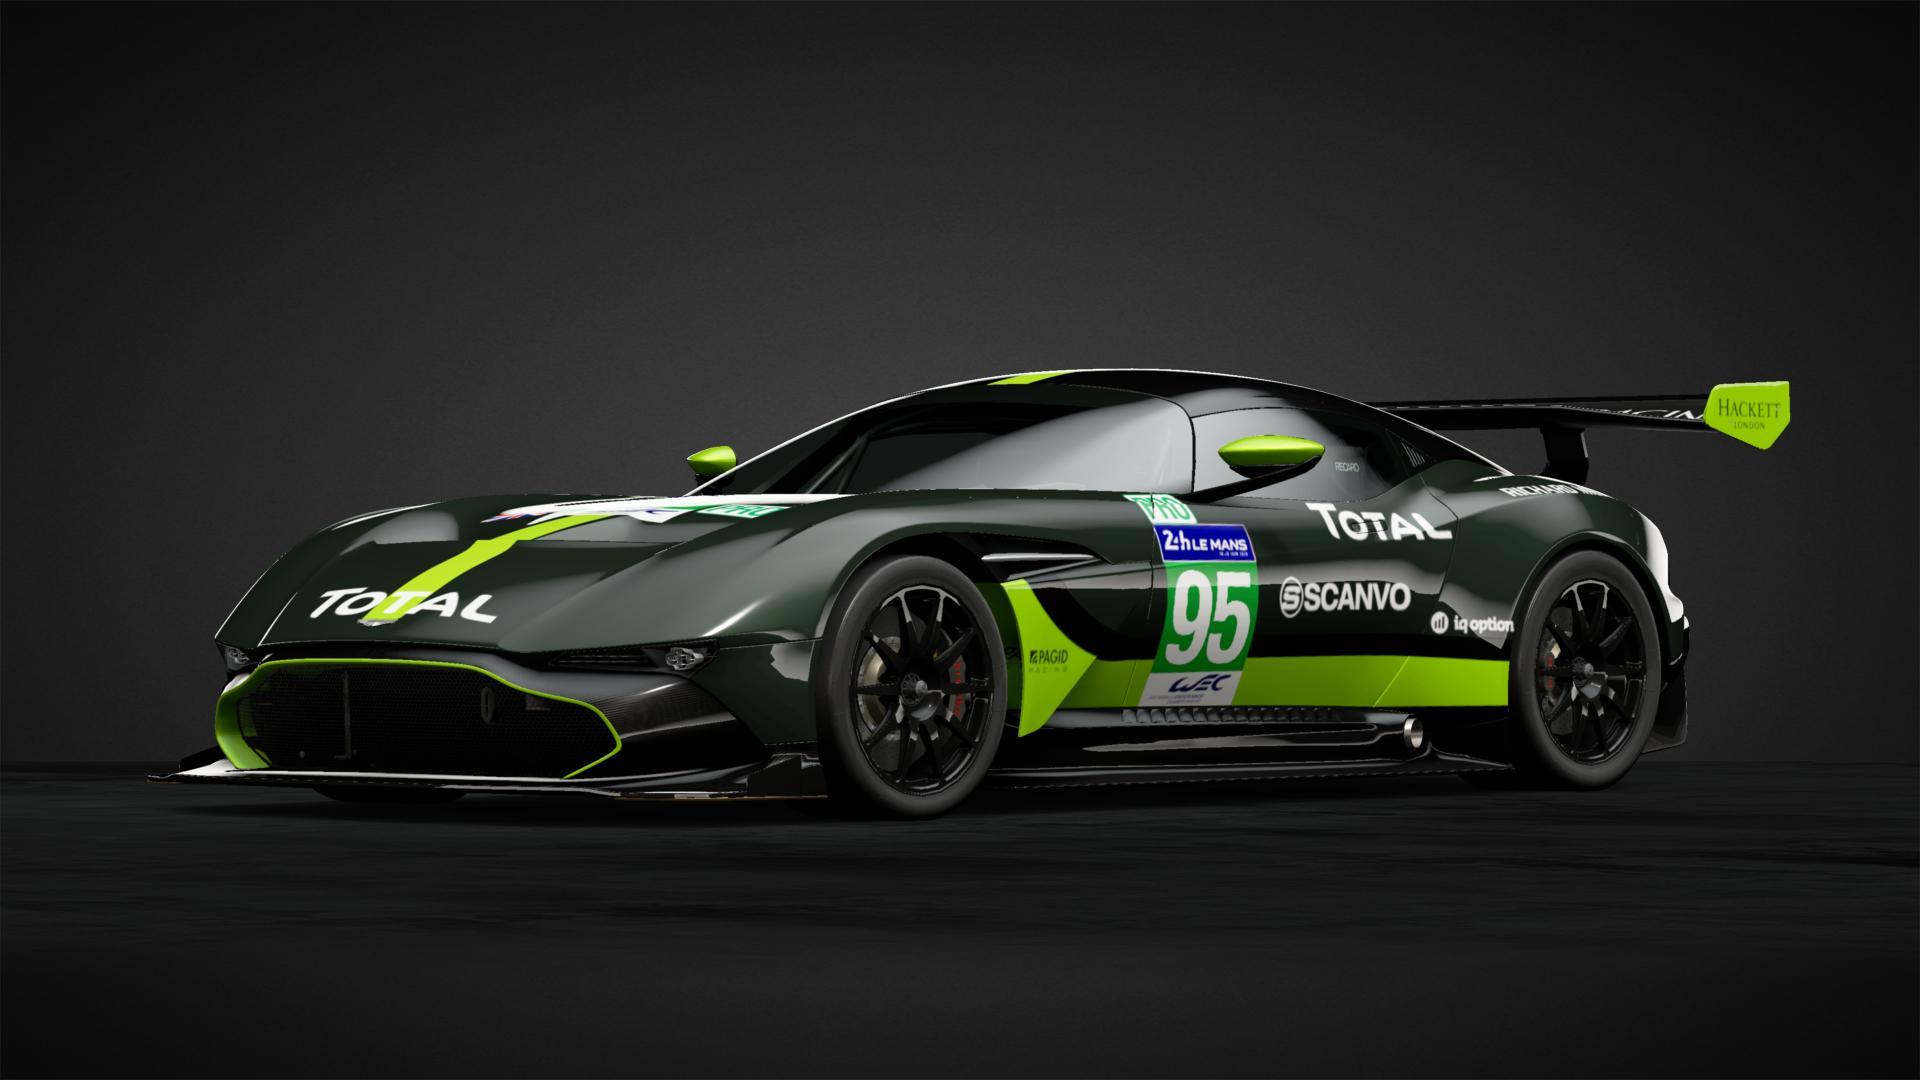 Aston Martin Vulcan Gte No 95 Car Livery By Speedchaserracin Community Gran Turismo Sport